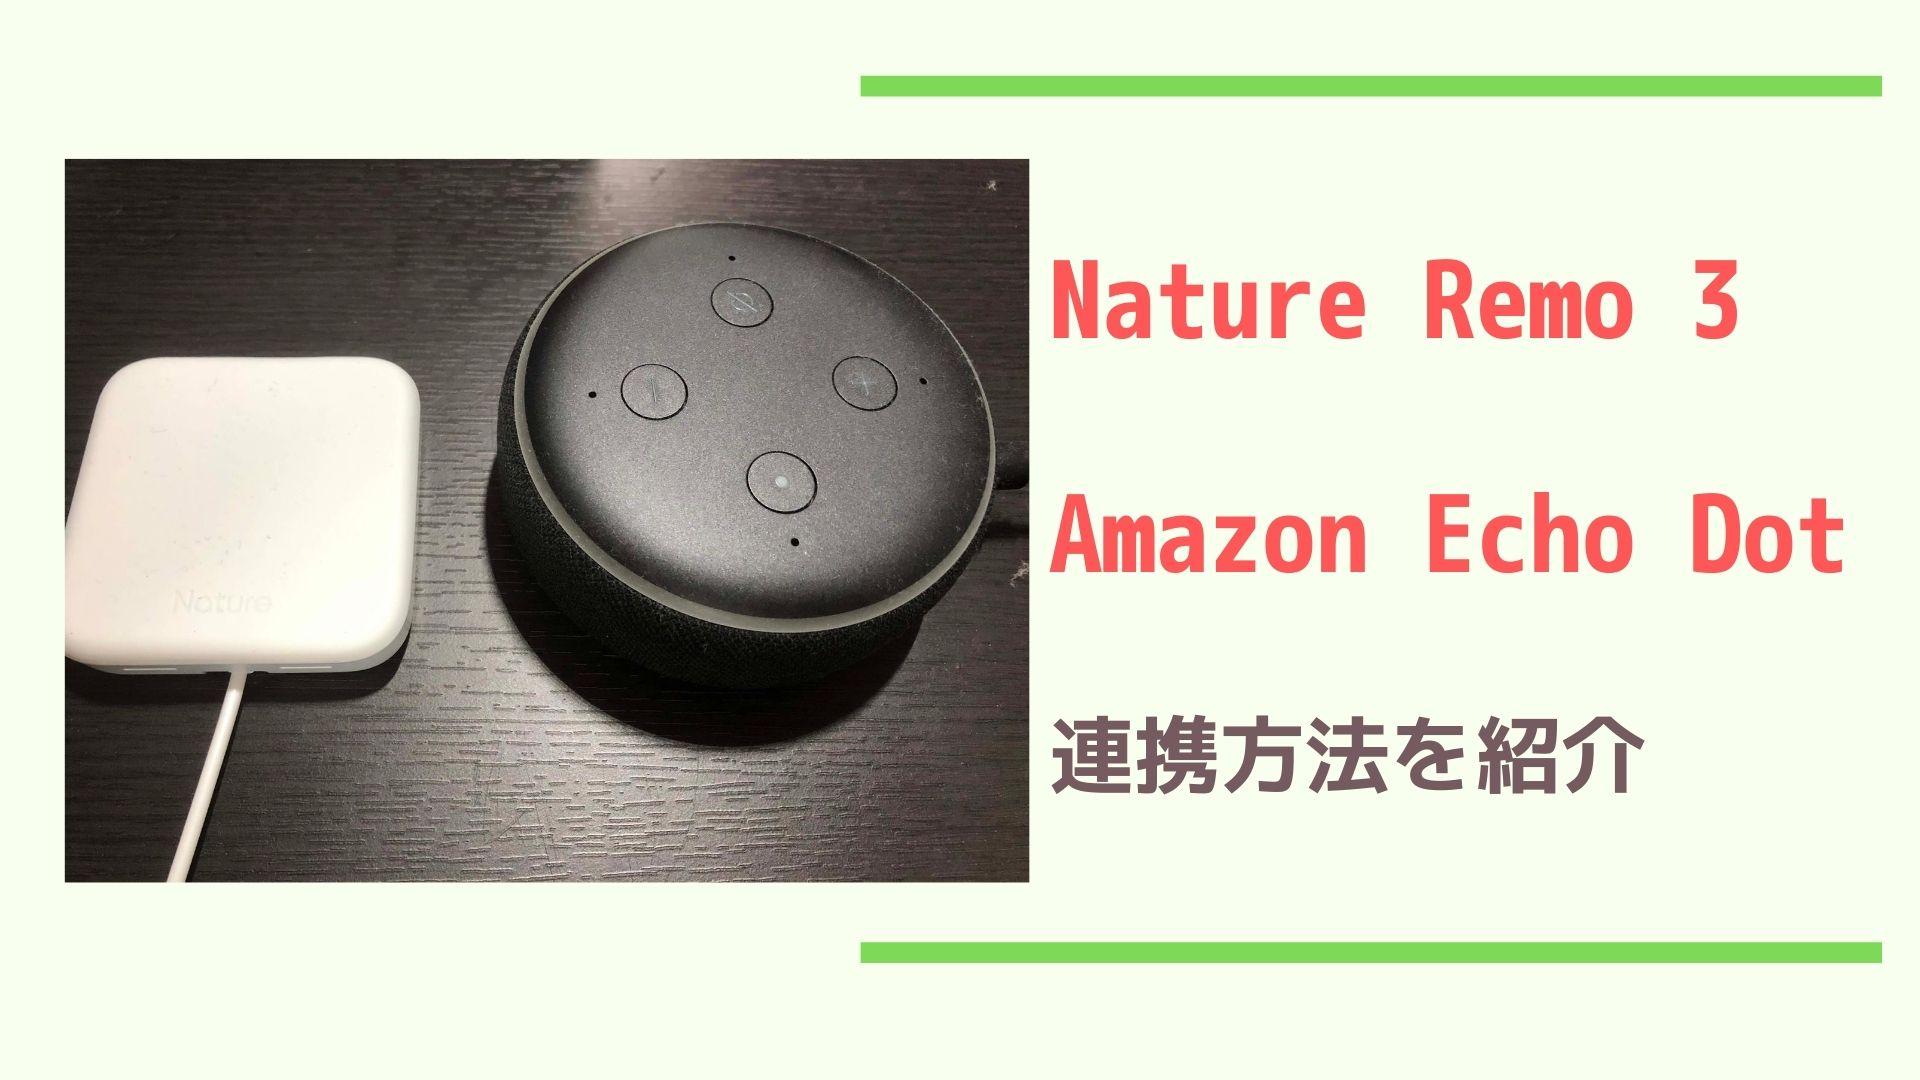 Nature Remo3とAmazon Echo dotの設定方法